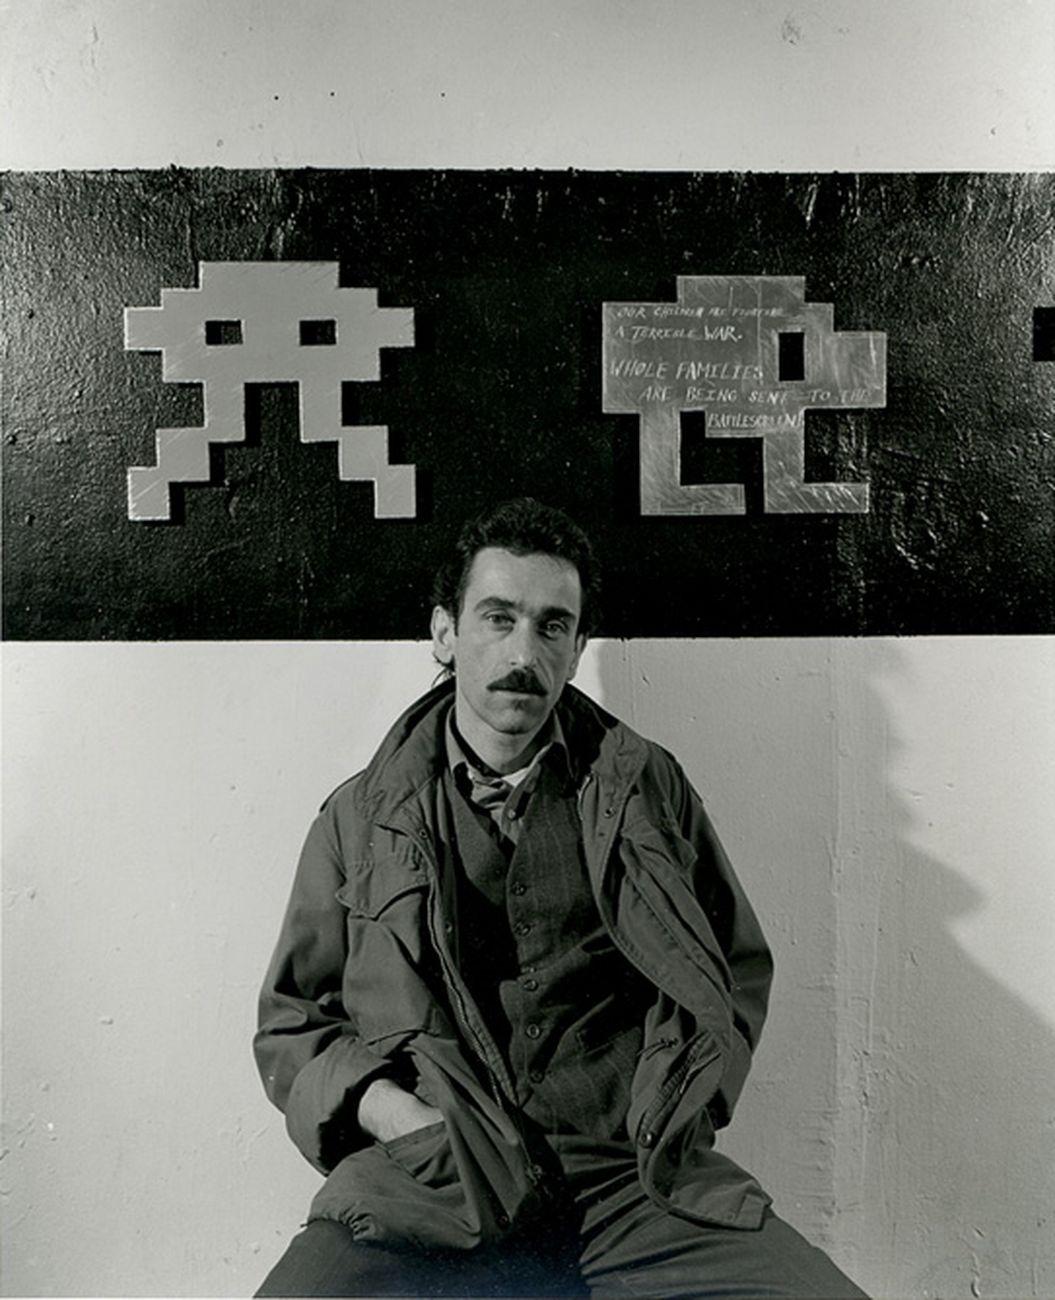 Don Leicht con gli Space Invaders in metallo, Bronx, NYC 1982. Photo Peter Bellamy